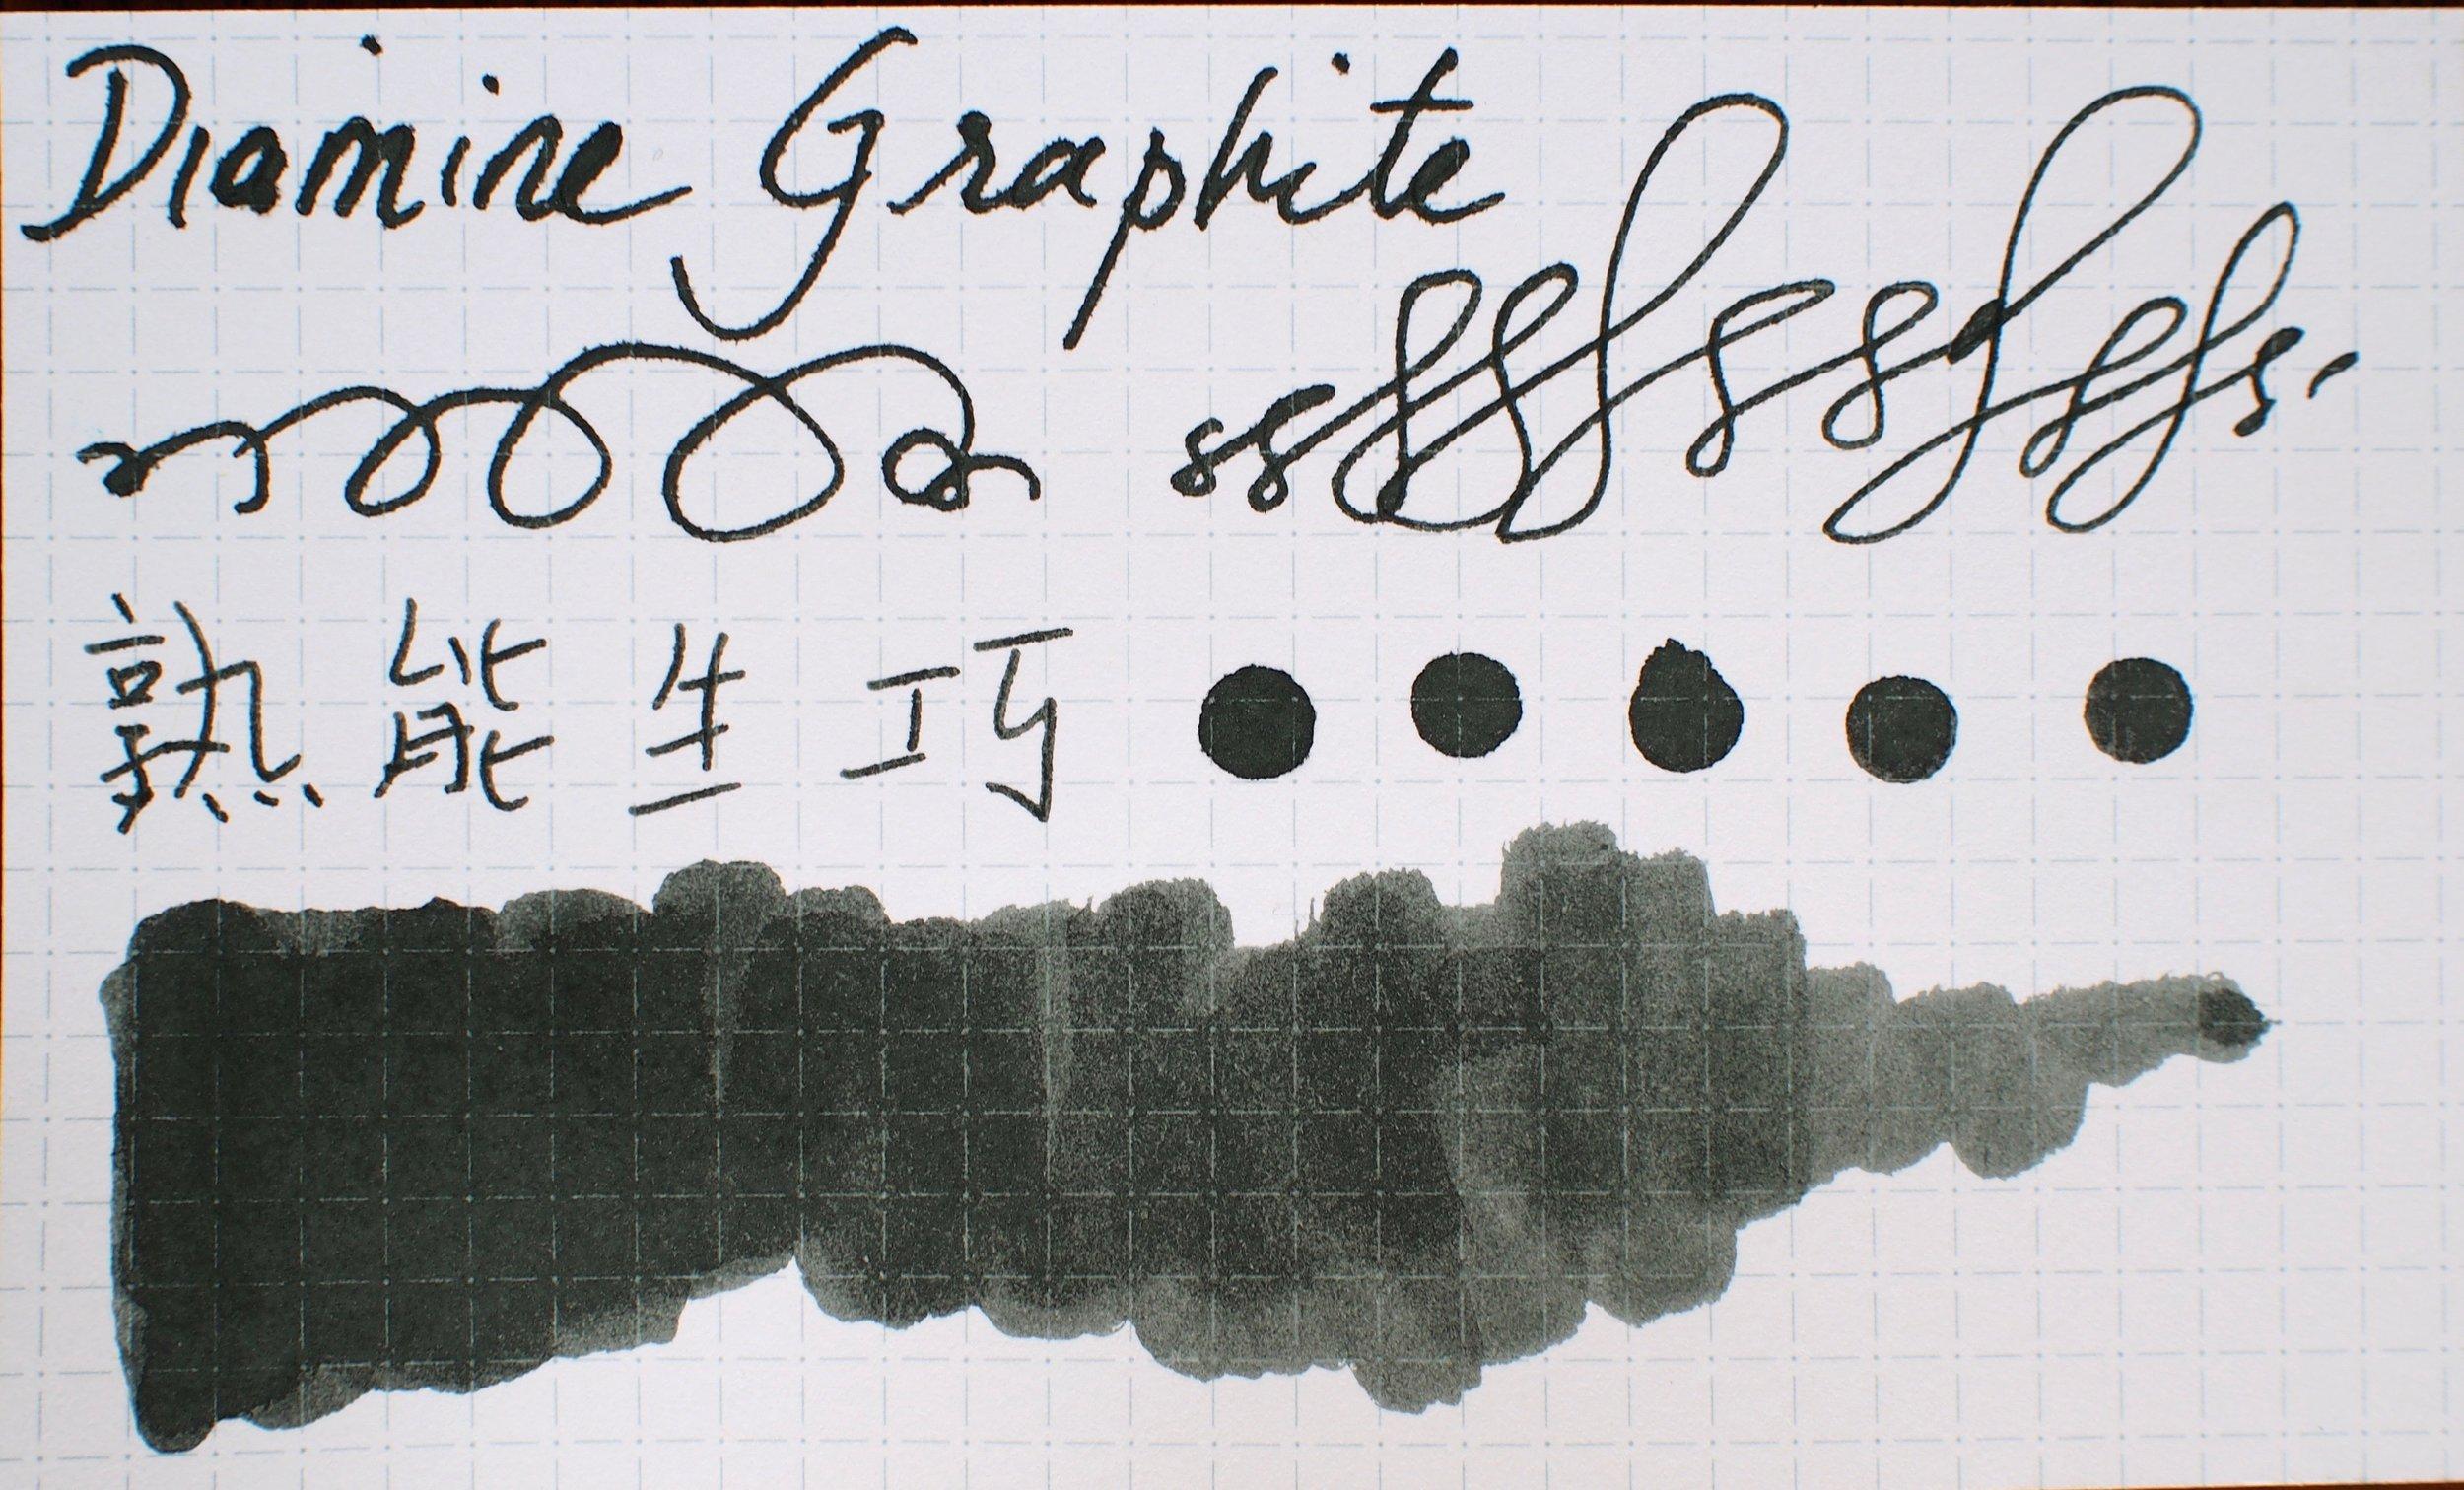 Ink Swab on Nock Co Dot Dash Notecard